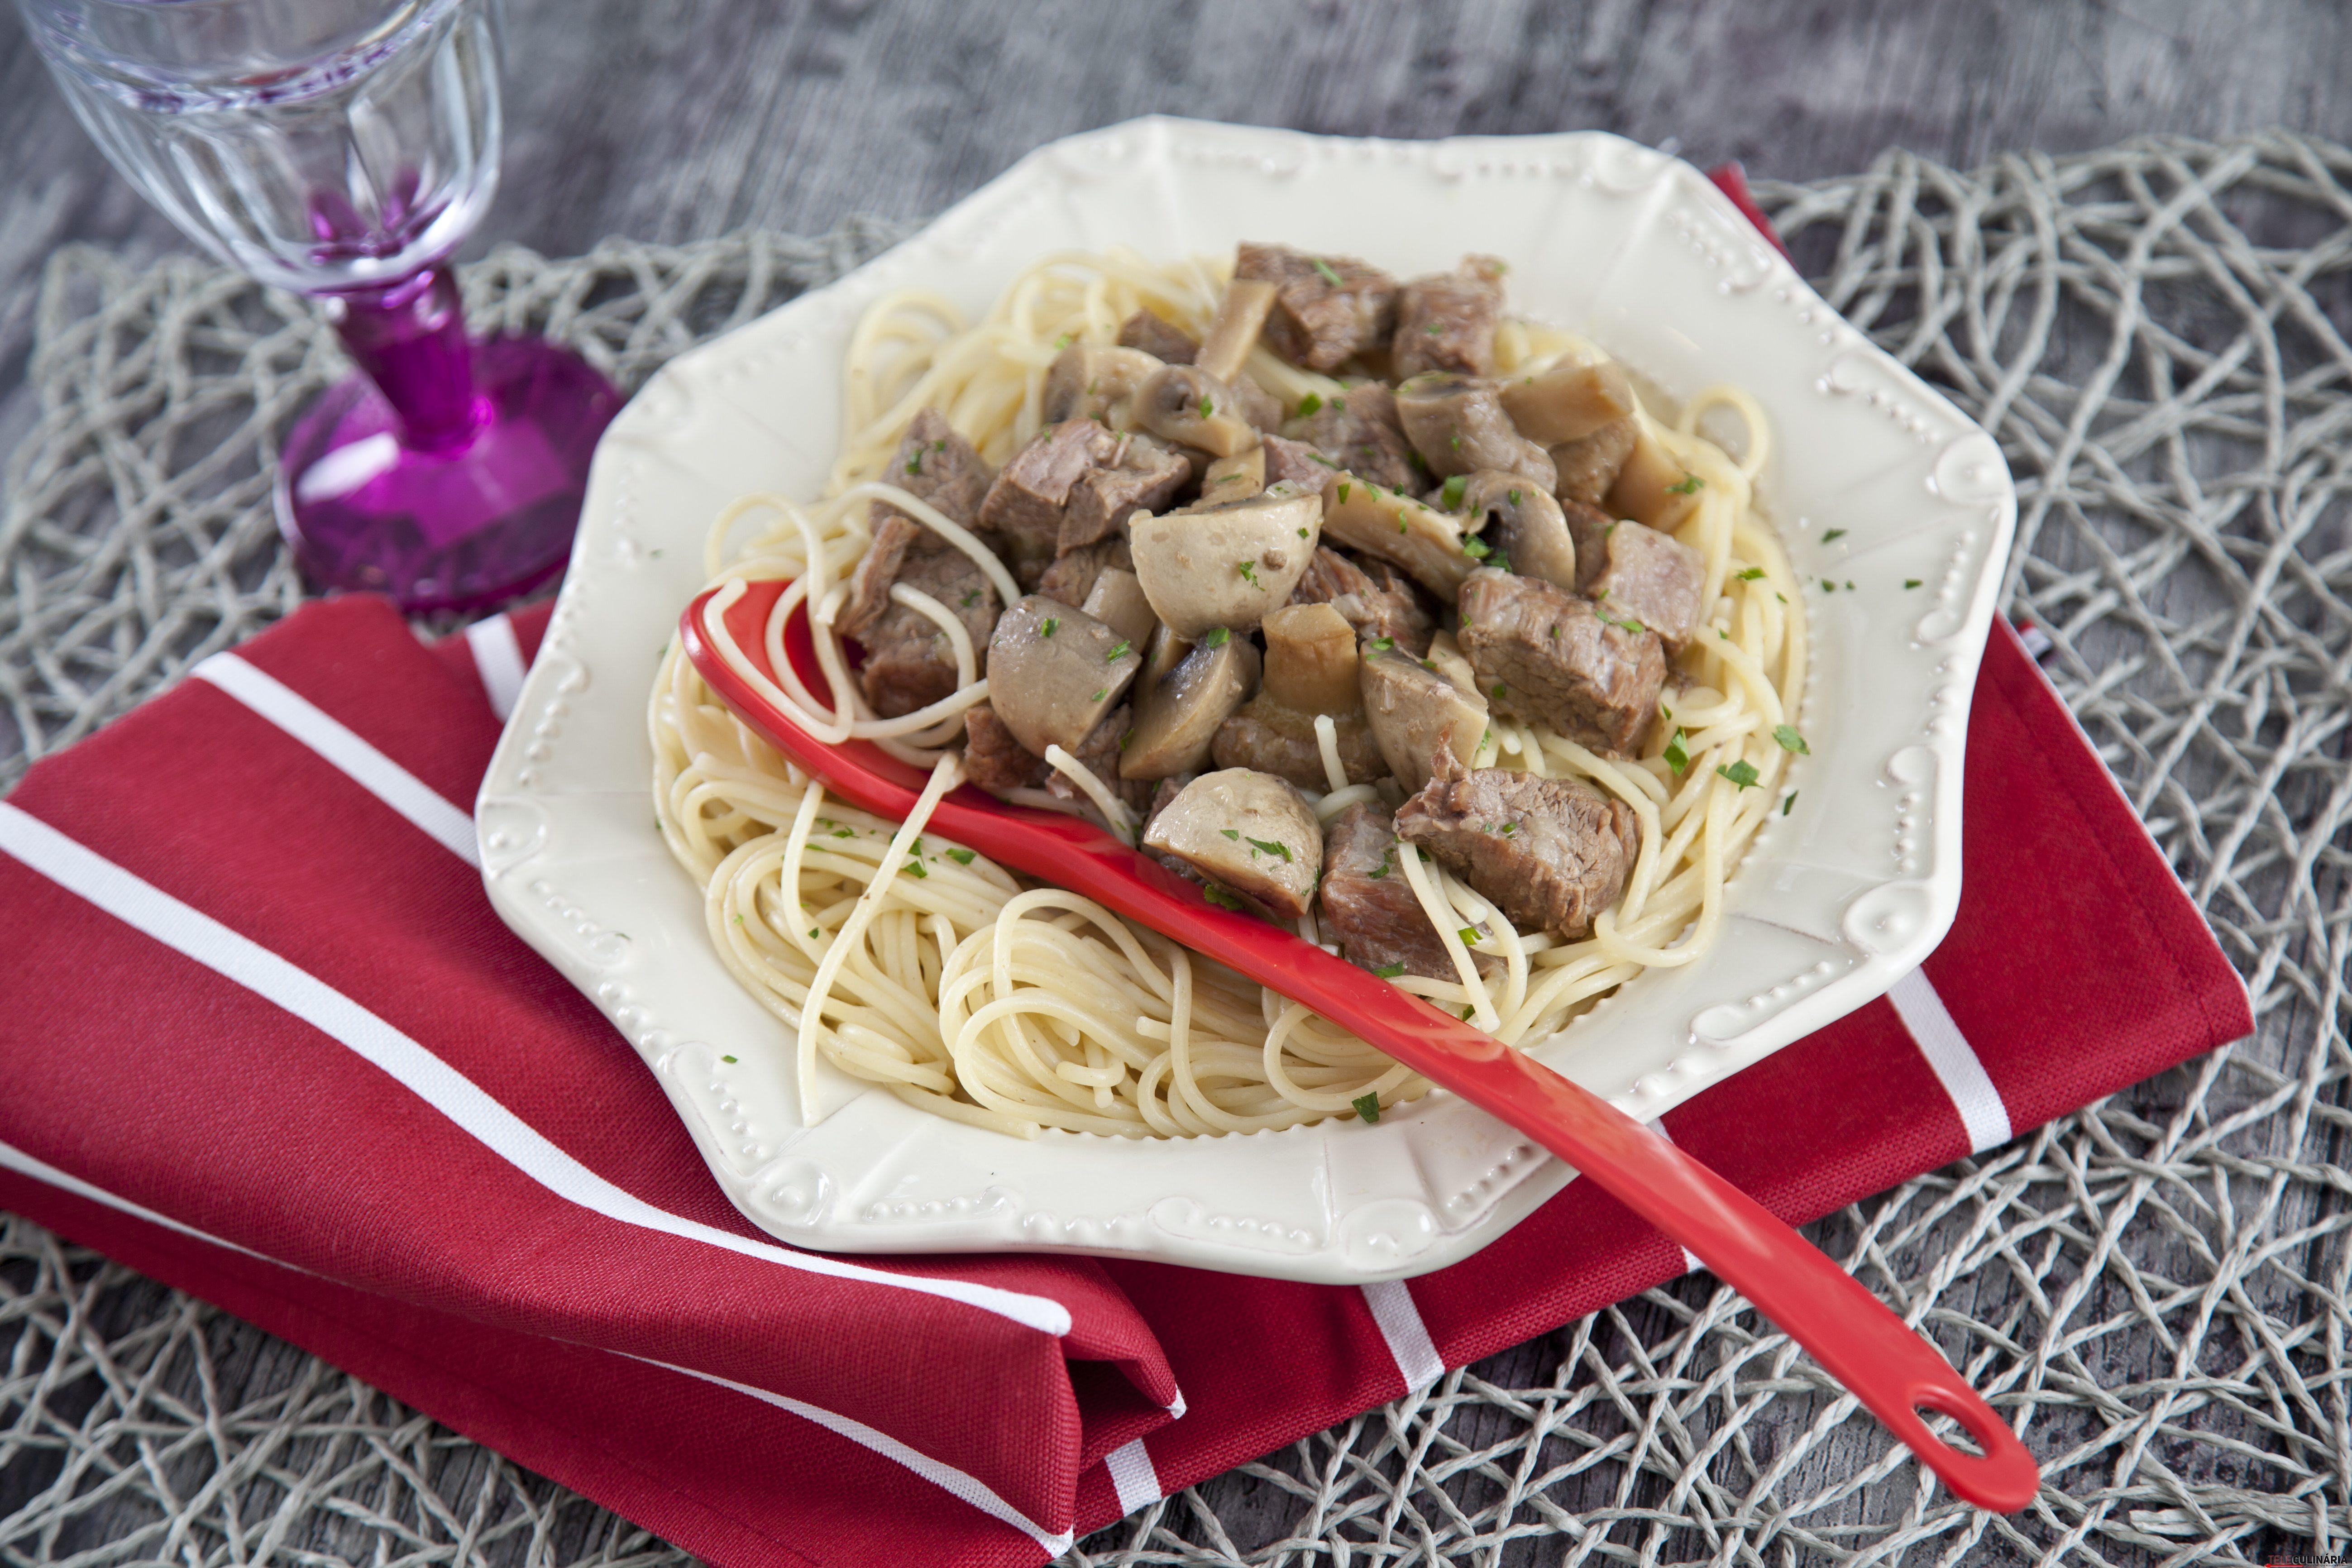 Carne estufada com cogumelos